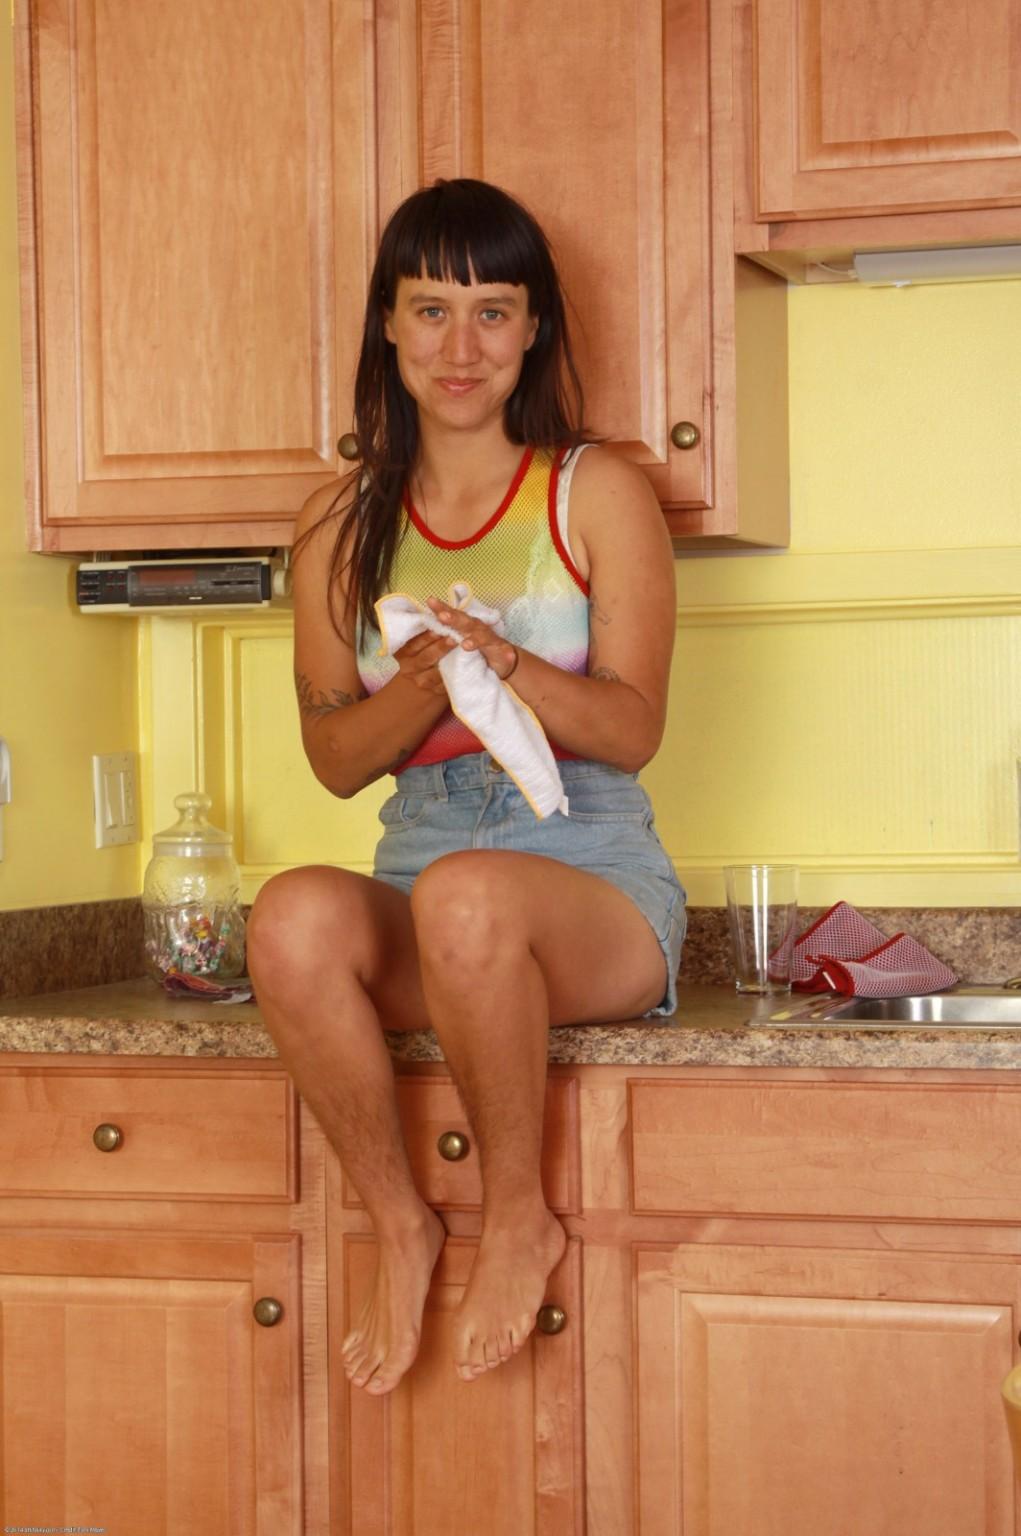 Sequoia показывает лохматые подмышки на кухне